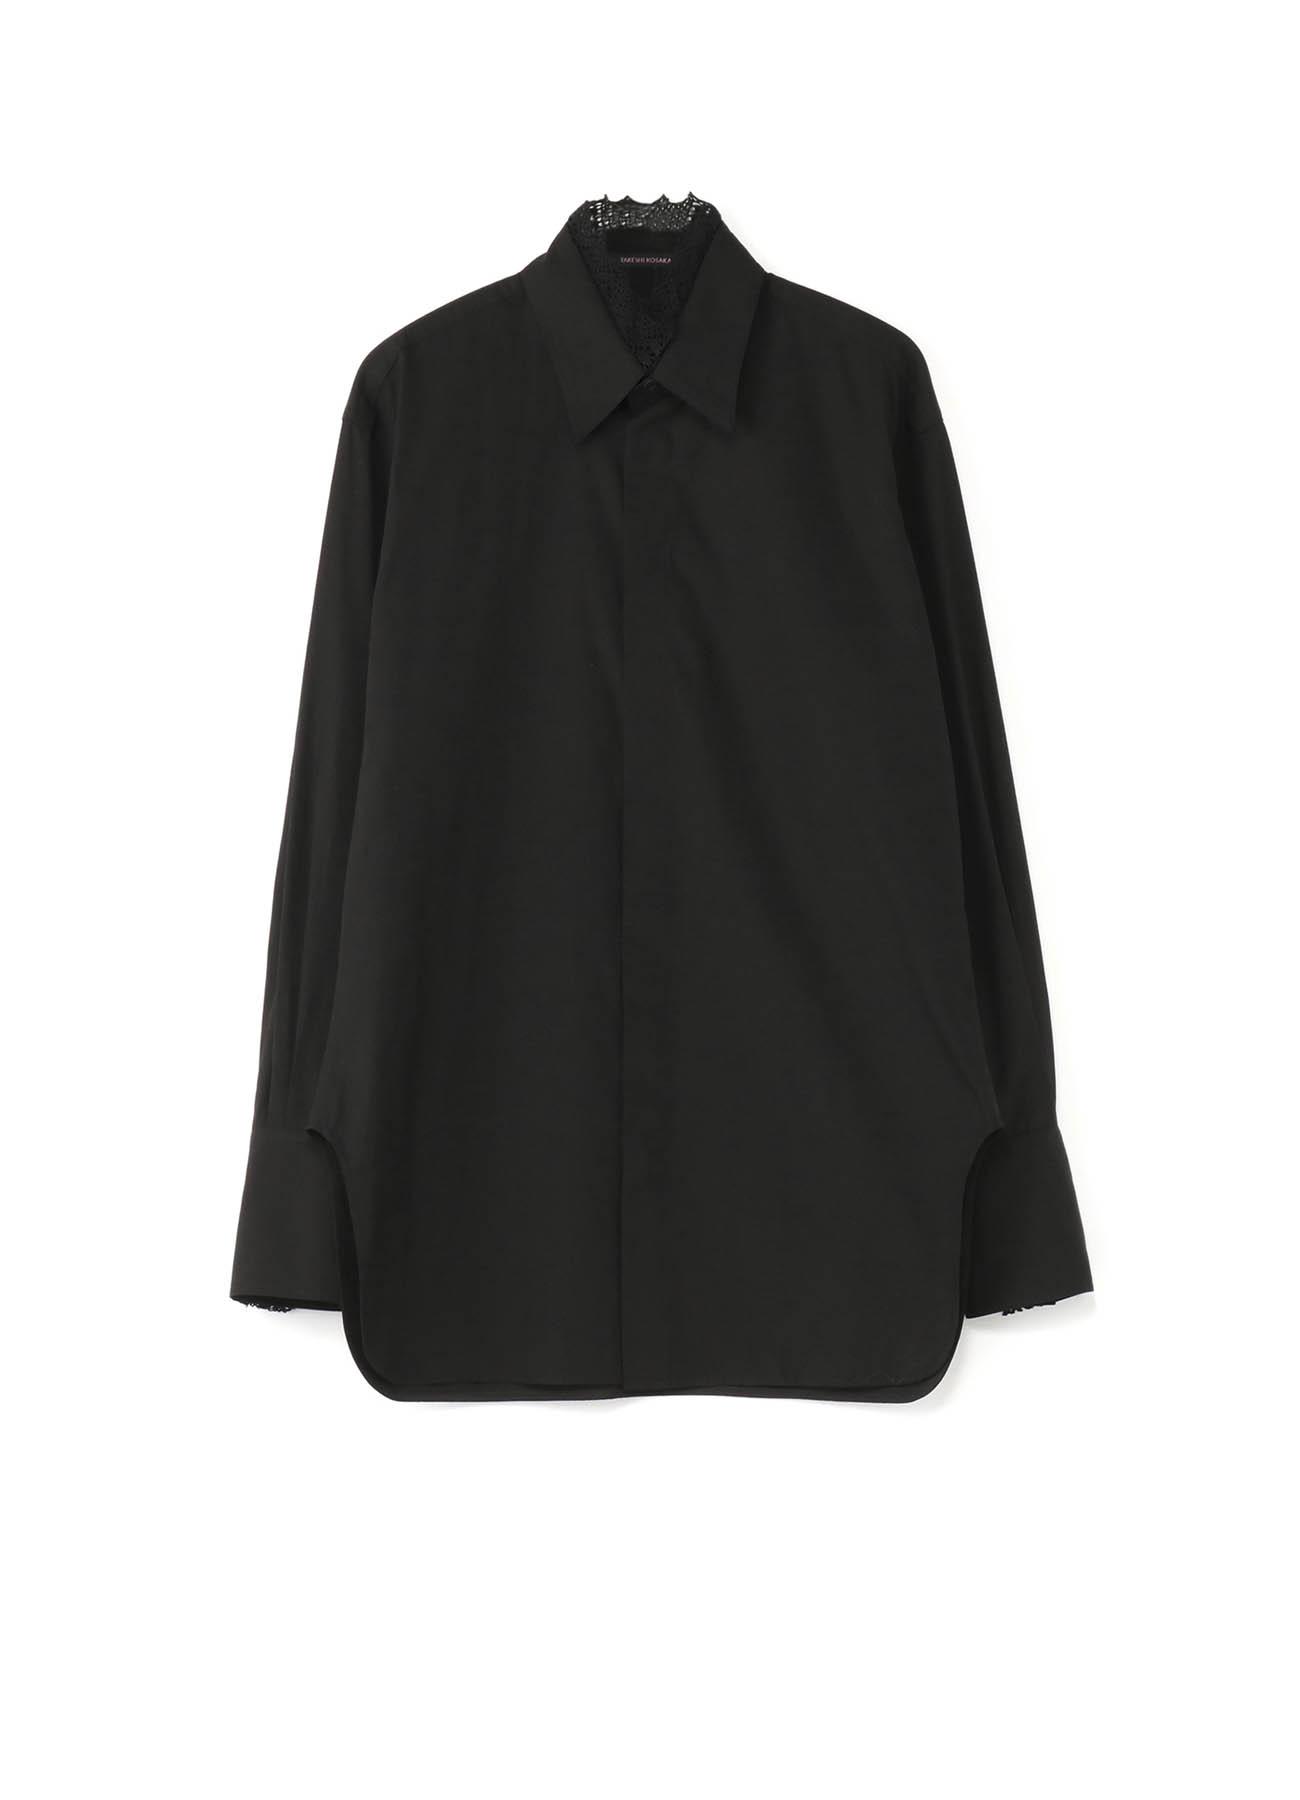 Y'sPINK 蕾丝装饰衬衫